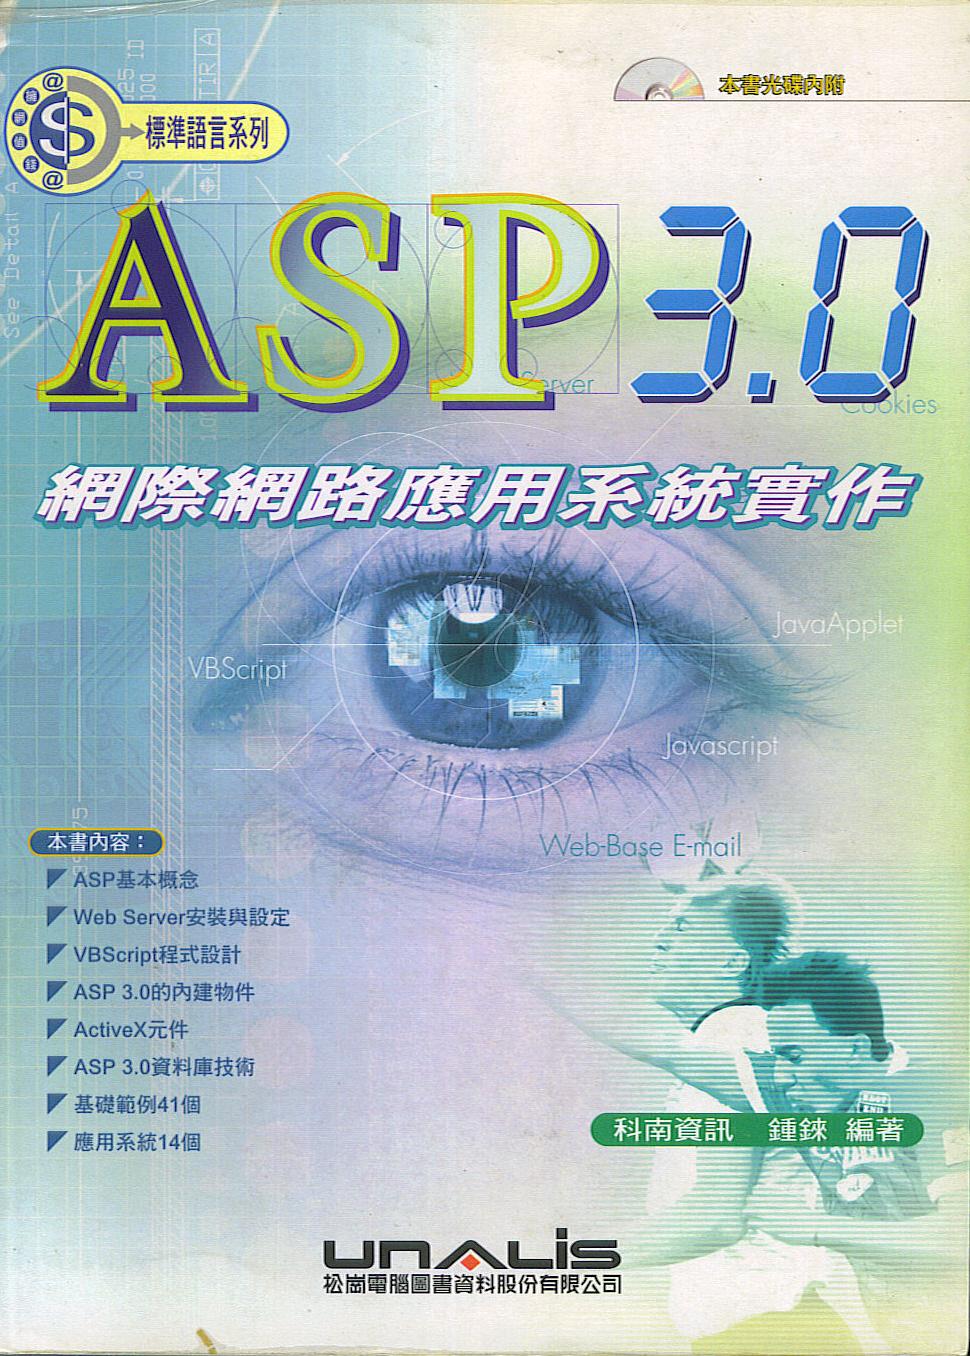 ASP 3.0網際網路應用系統實作